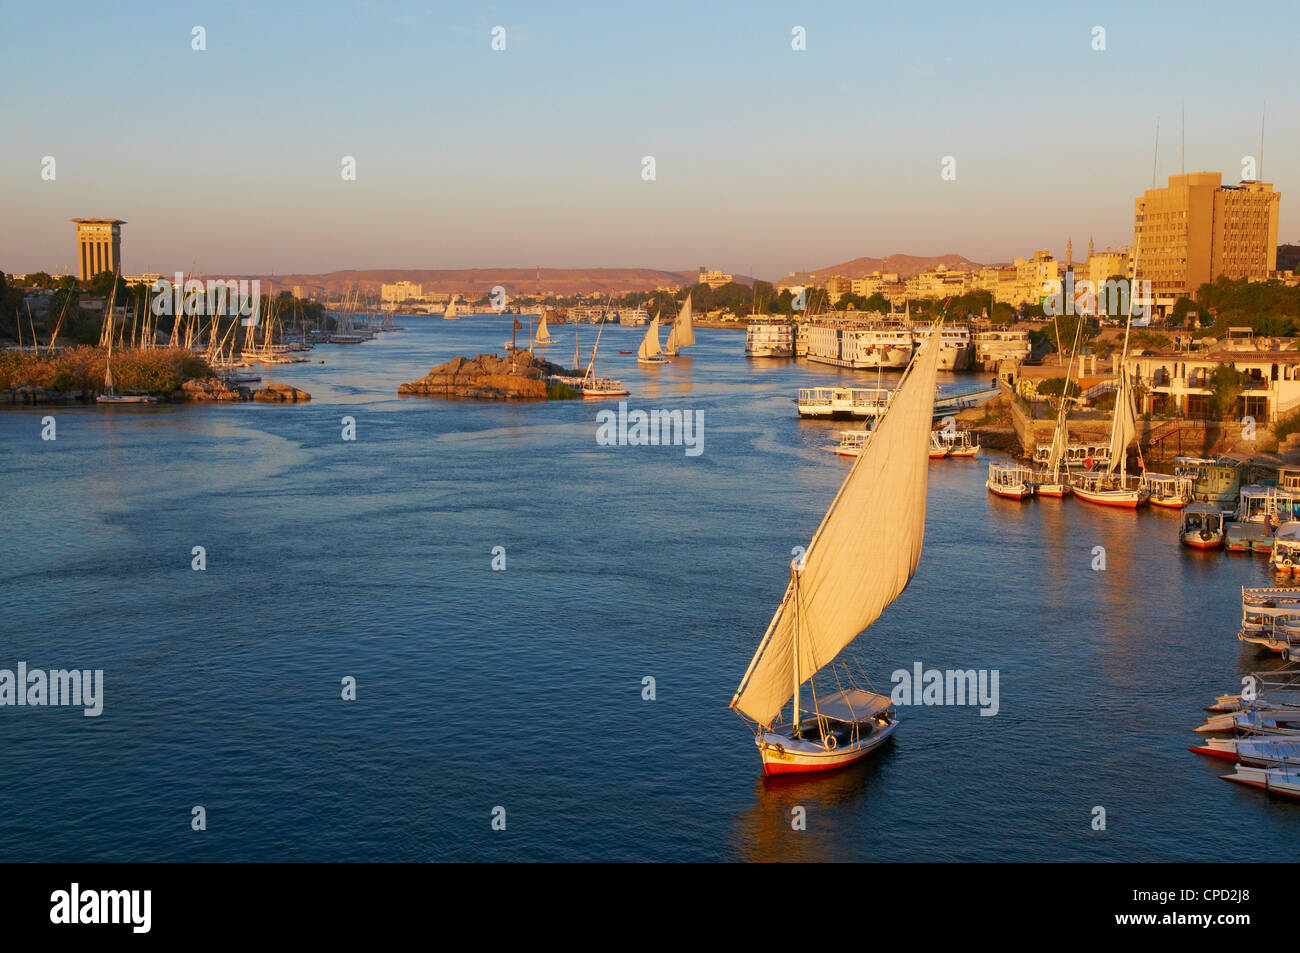 Feluken am Fluss Nil, Assuan, Ägypten, Nordafrika, Afrika Stockbild